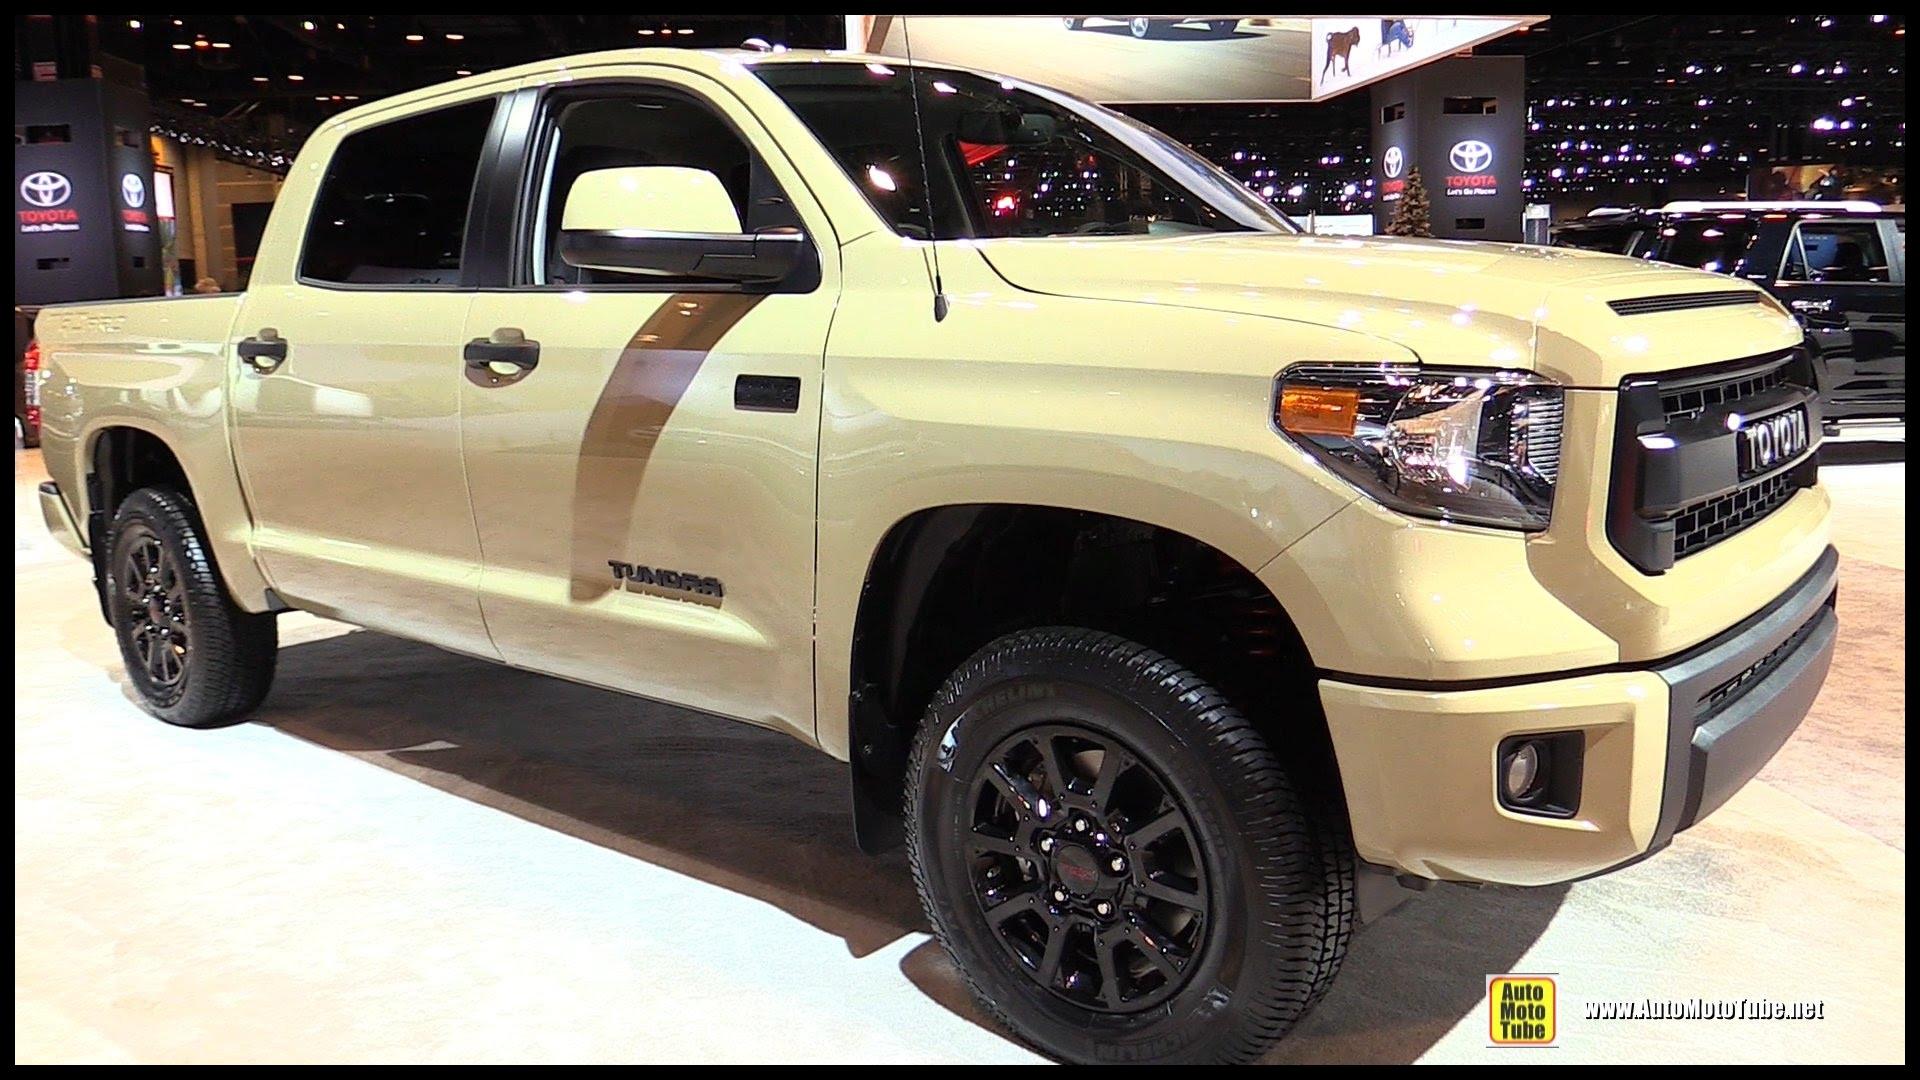 2018 toyota Tundra Trd Pro Colors New 2016 toyota Tundra Trd Pro Exterior and Interior Walkaround